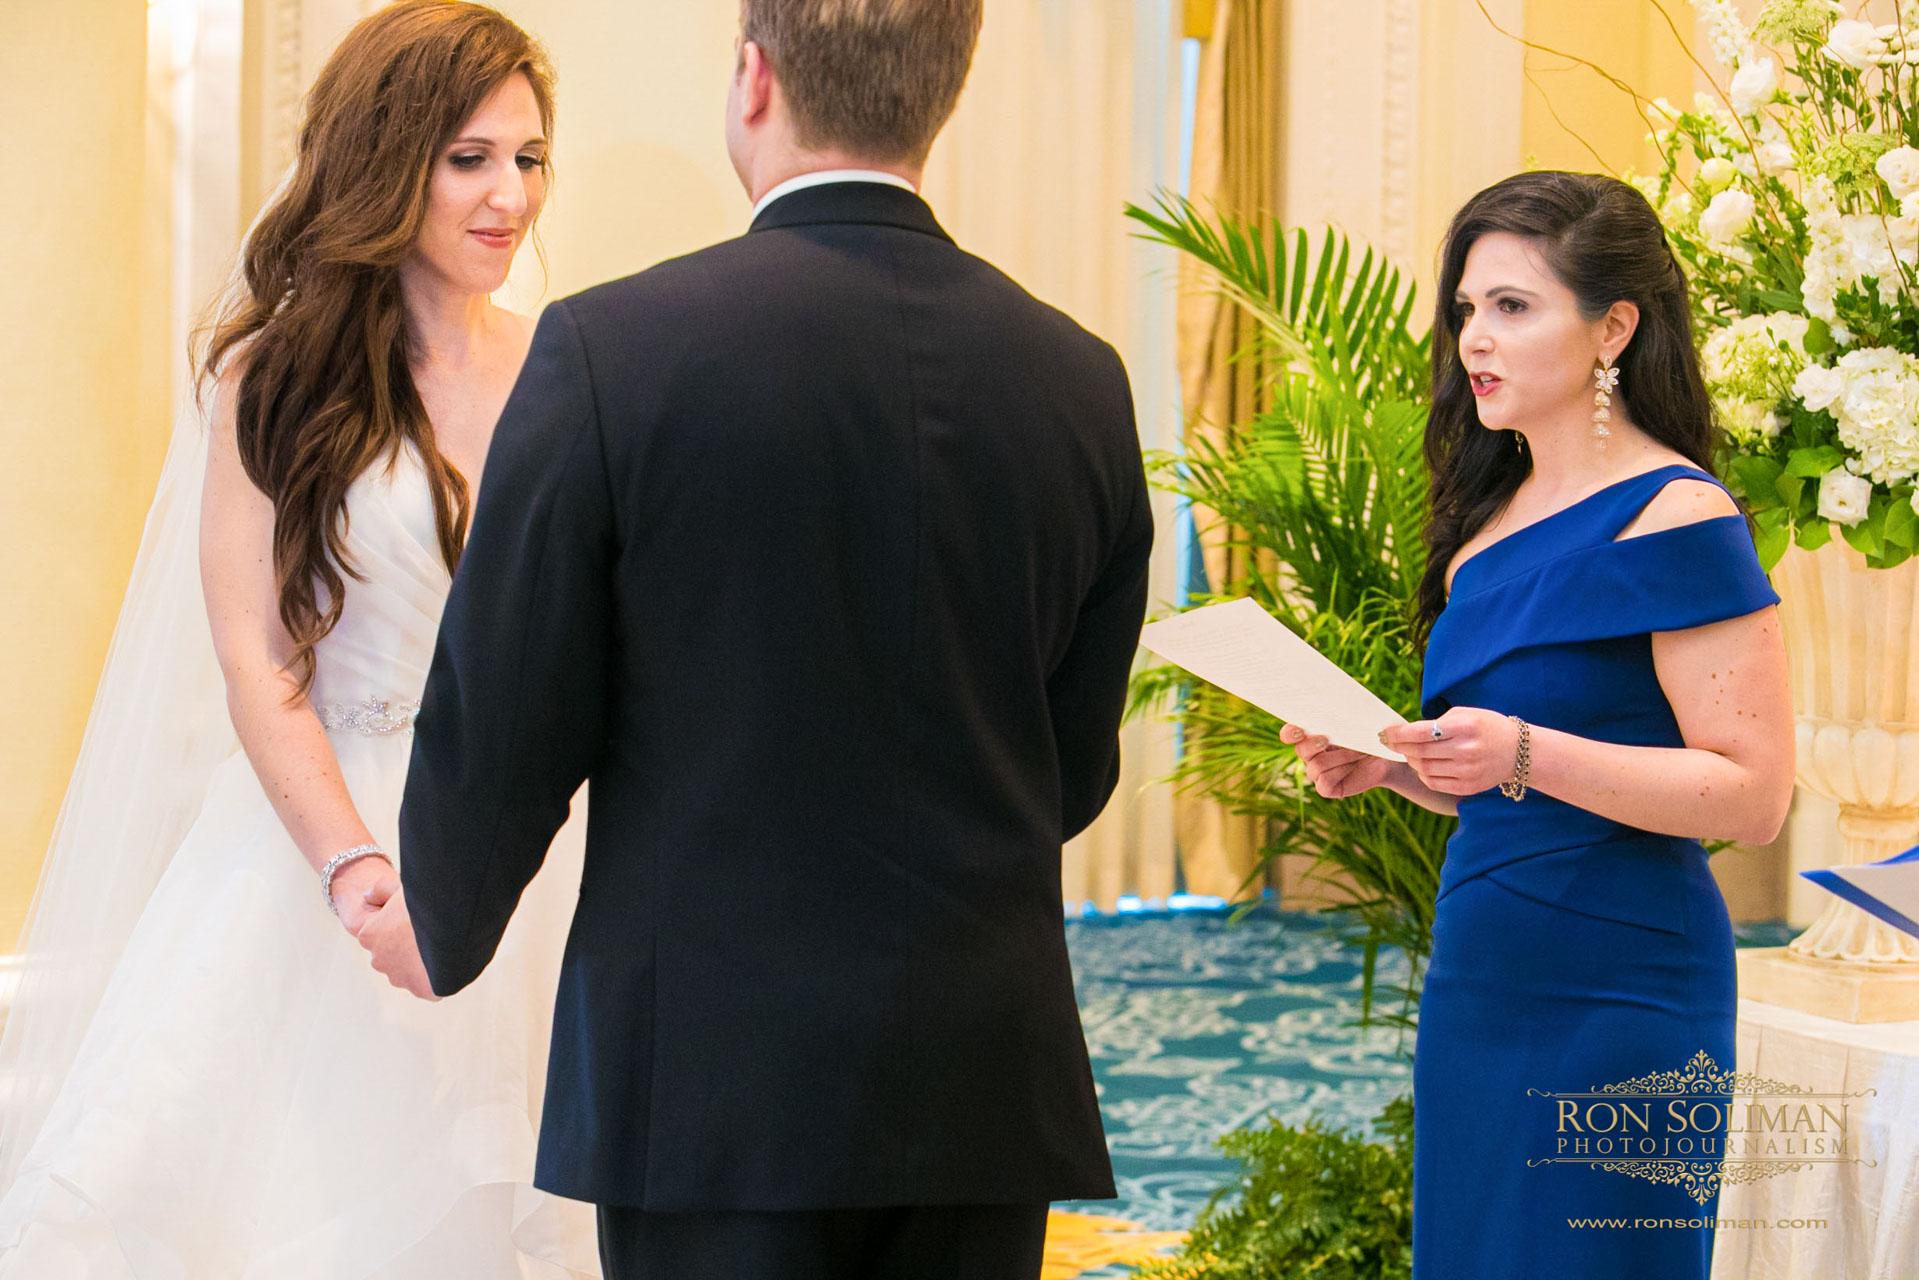 THE JEFFERSON HOTEL WEDDING 27